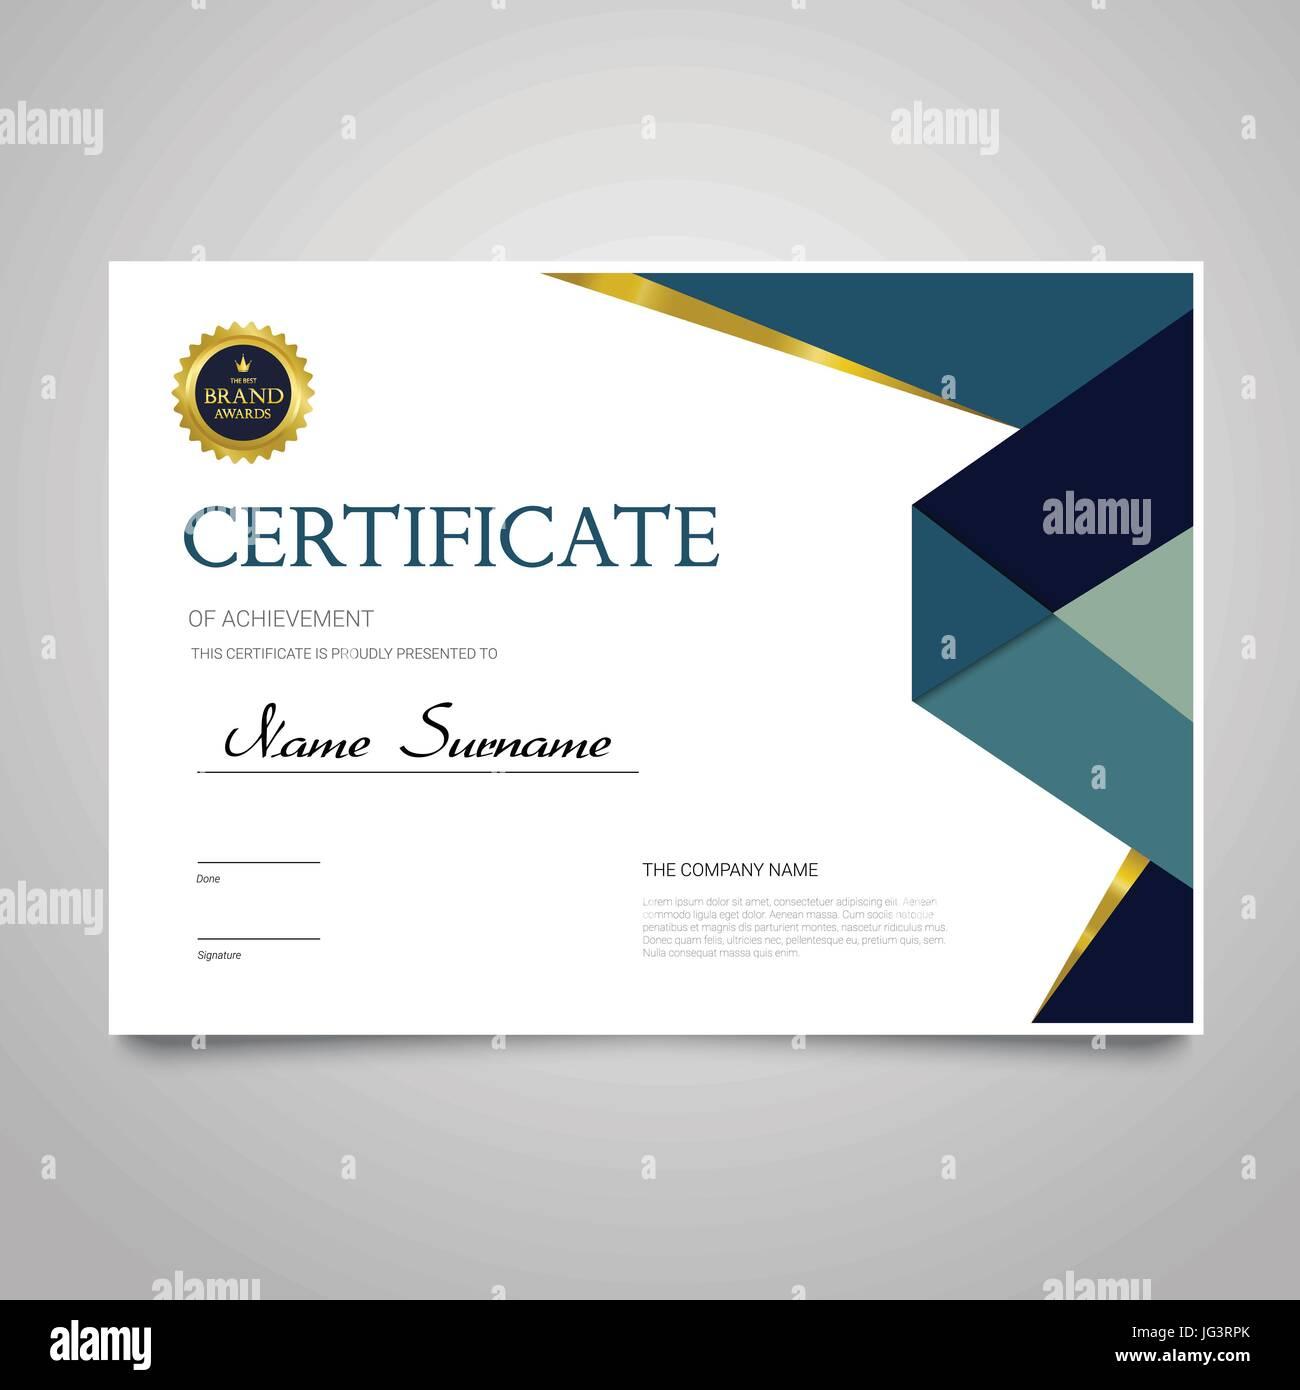 Zertifikat-Vorlage - moderne horizontale elegante Vektor Dokument ...